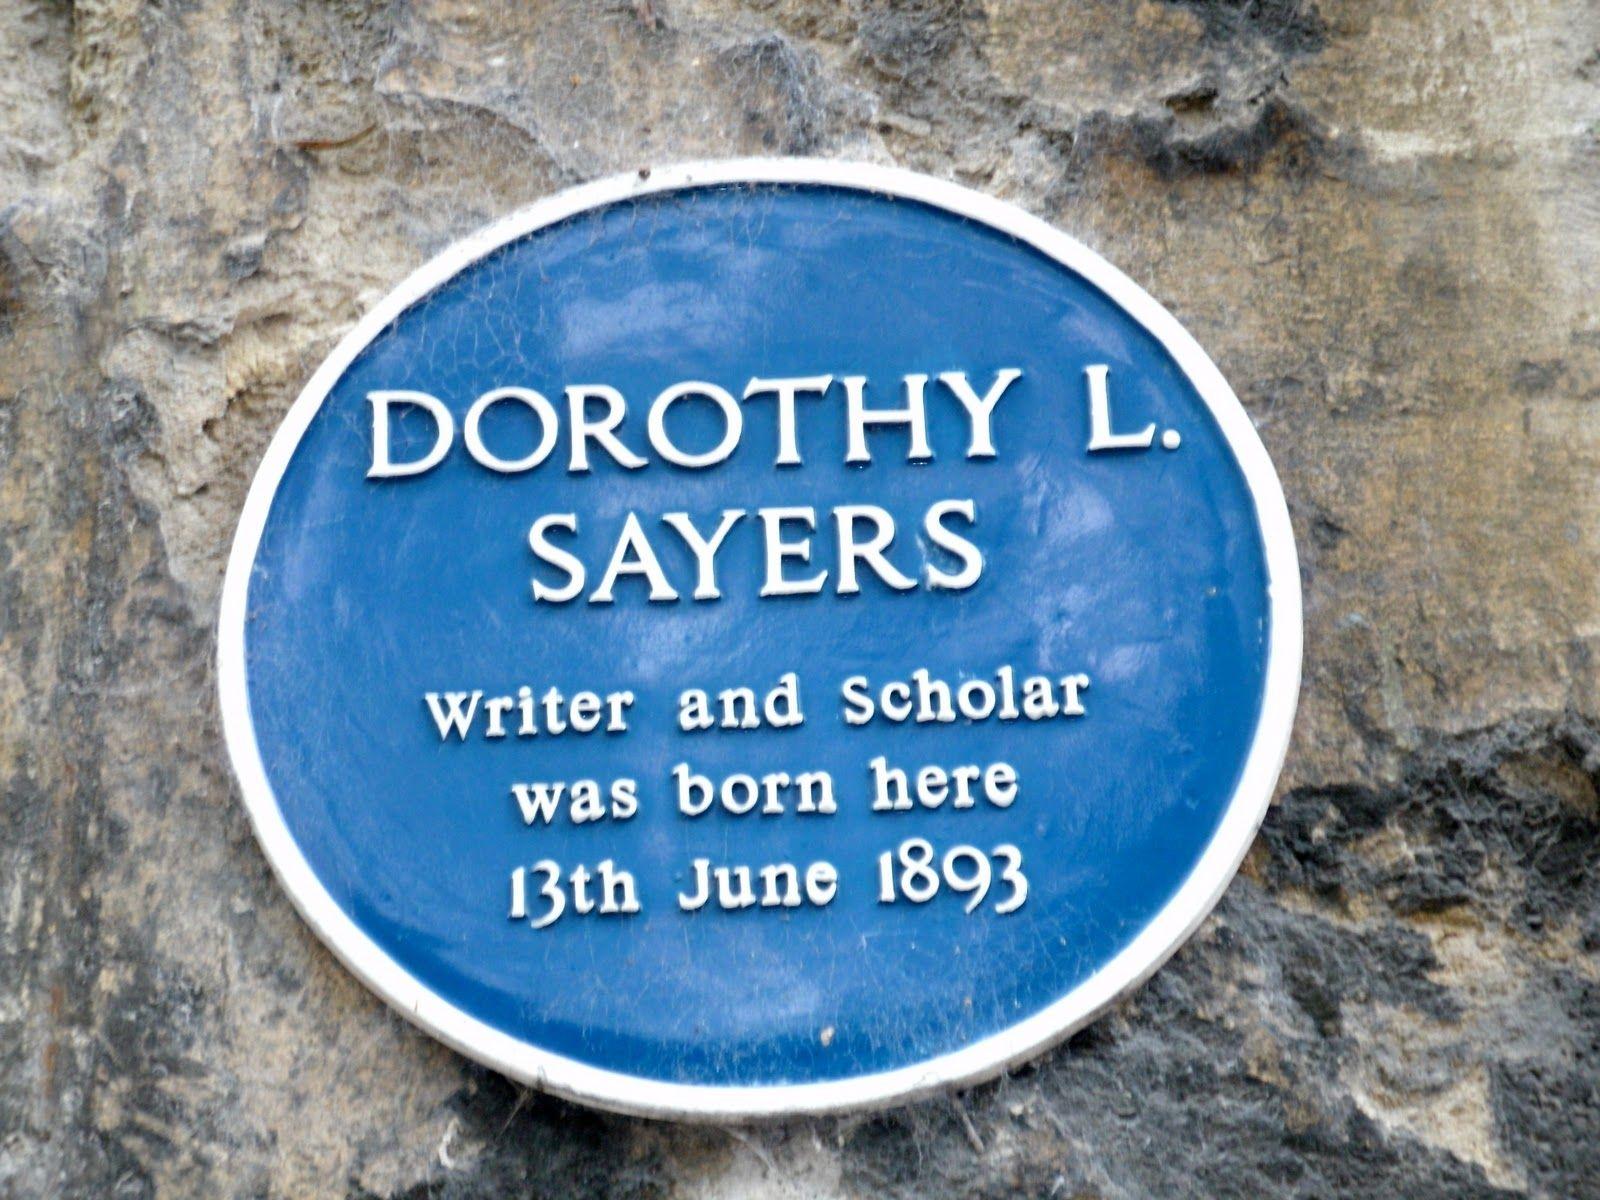 Dorothy sayers blue plaque dorothy author writer